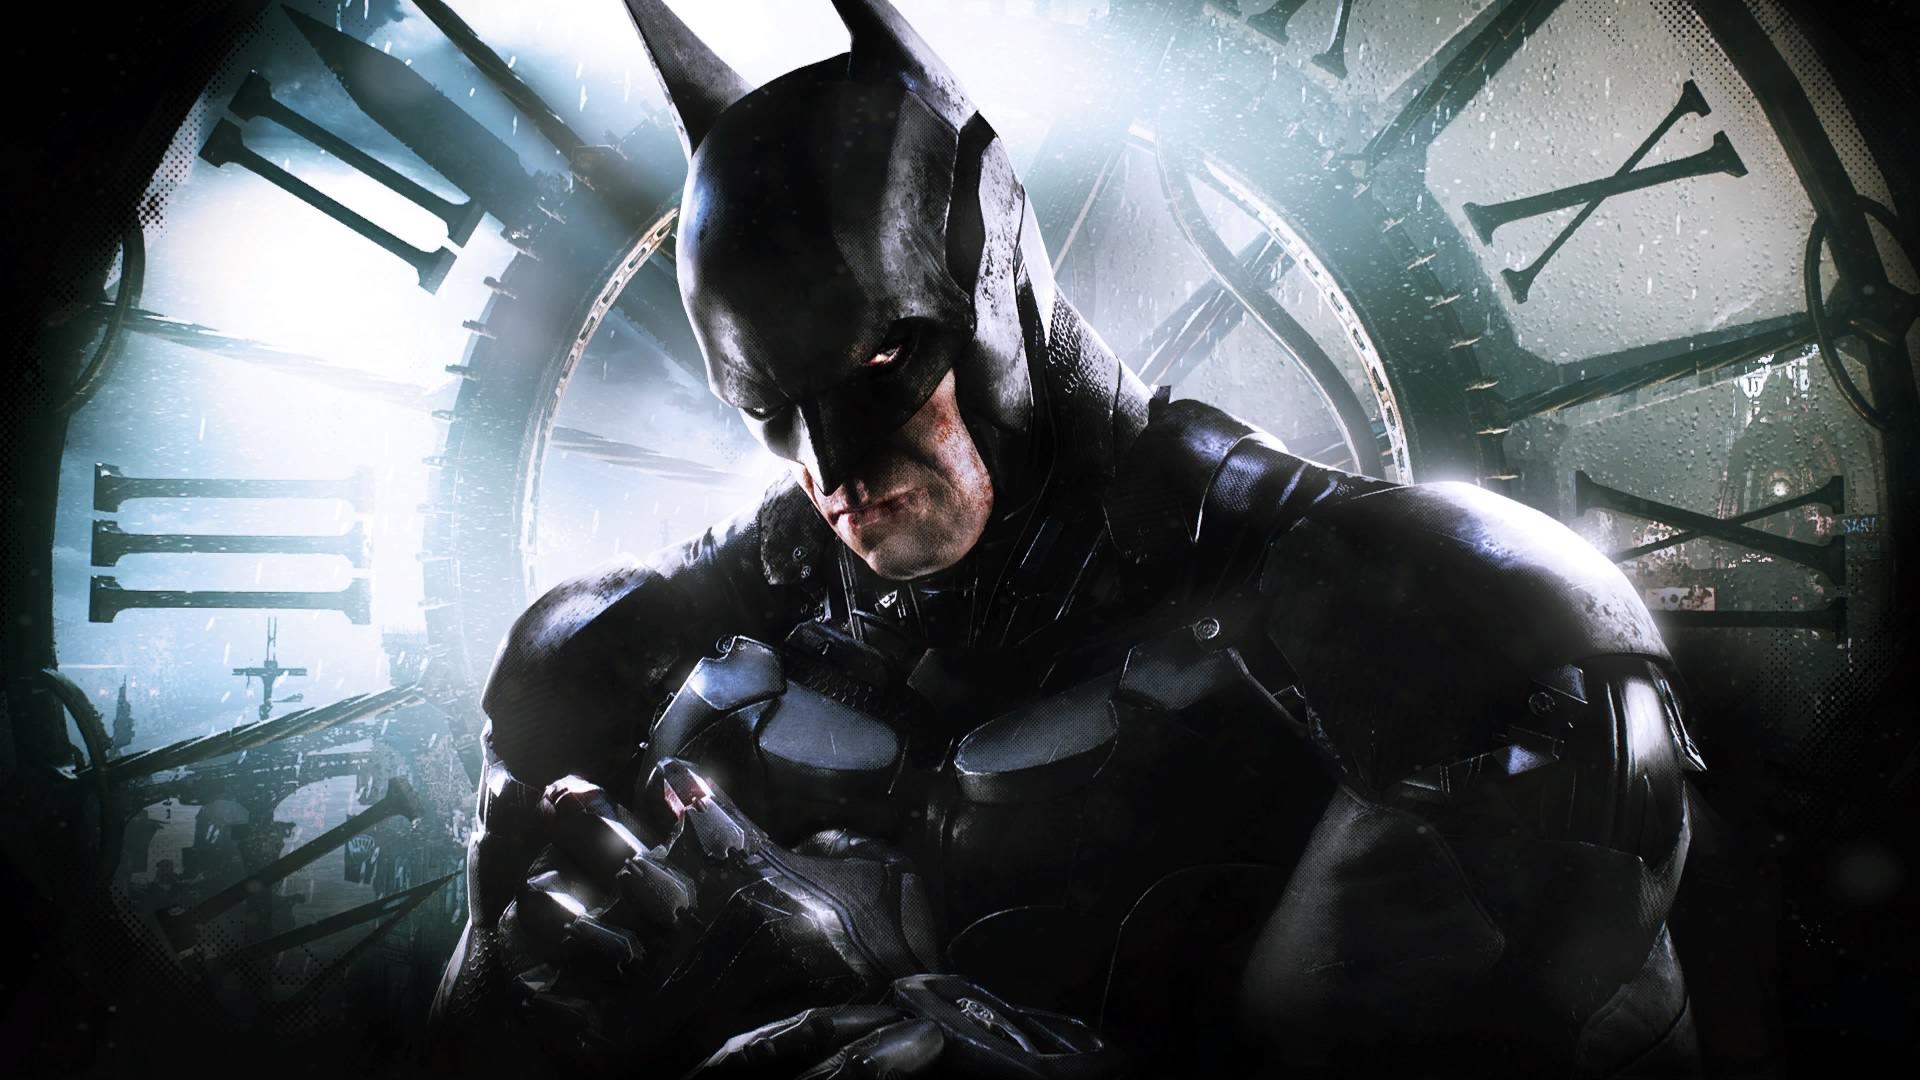 Arkham Knight Hd Wallpaper Batman Arkham Knight Profile 292028